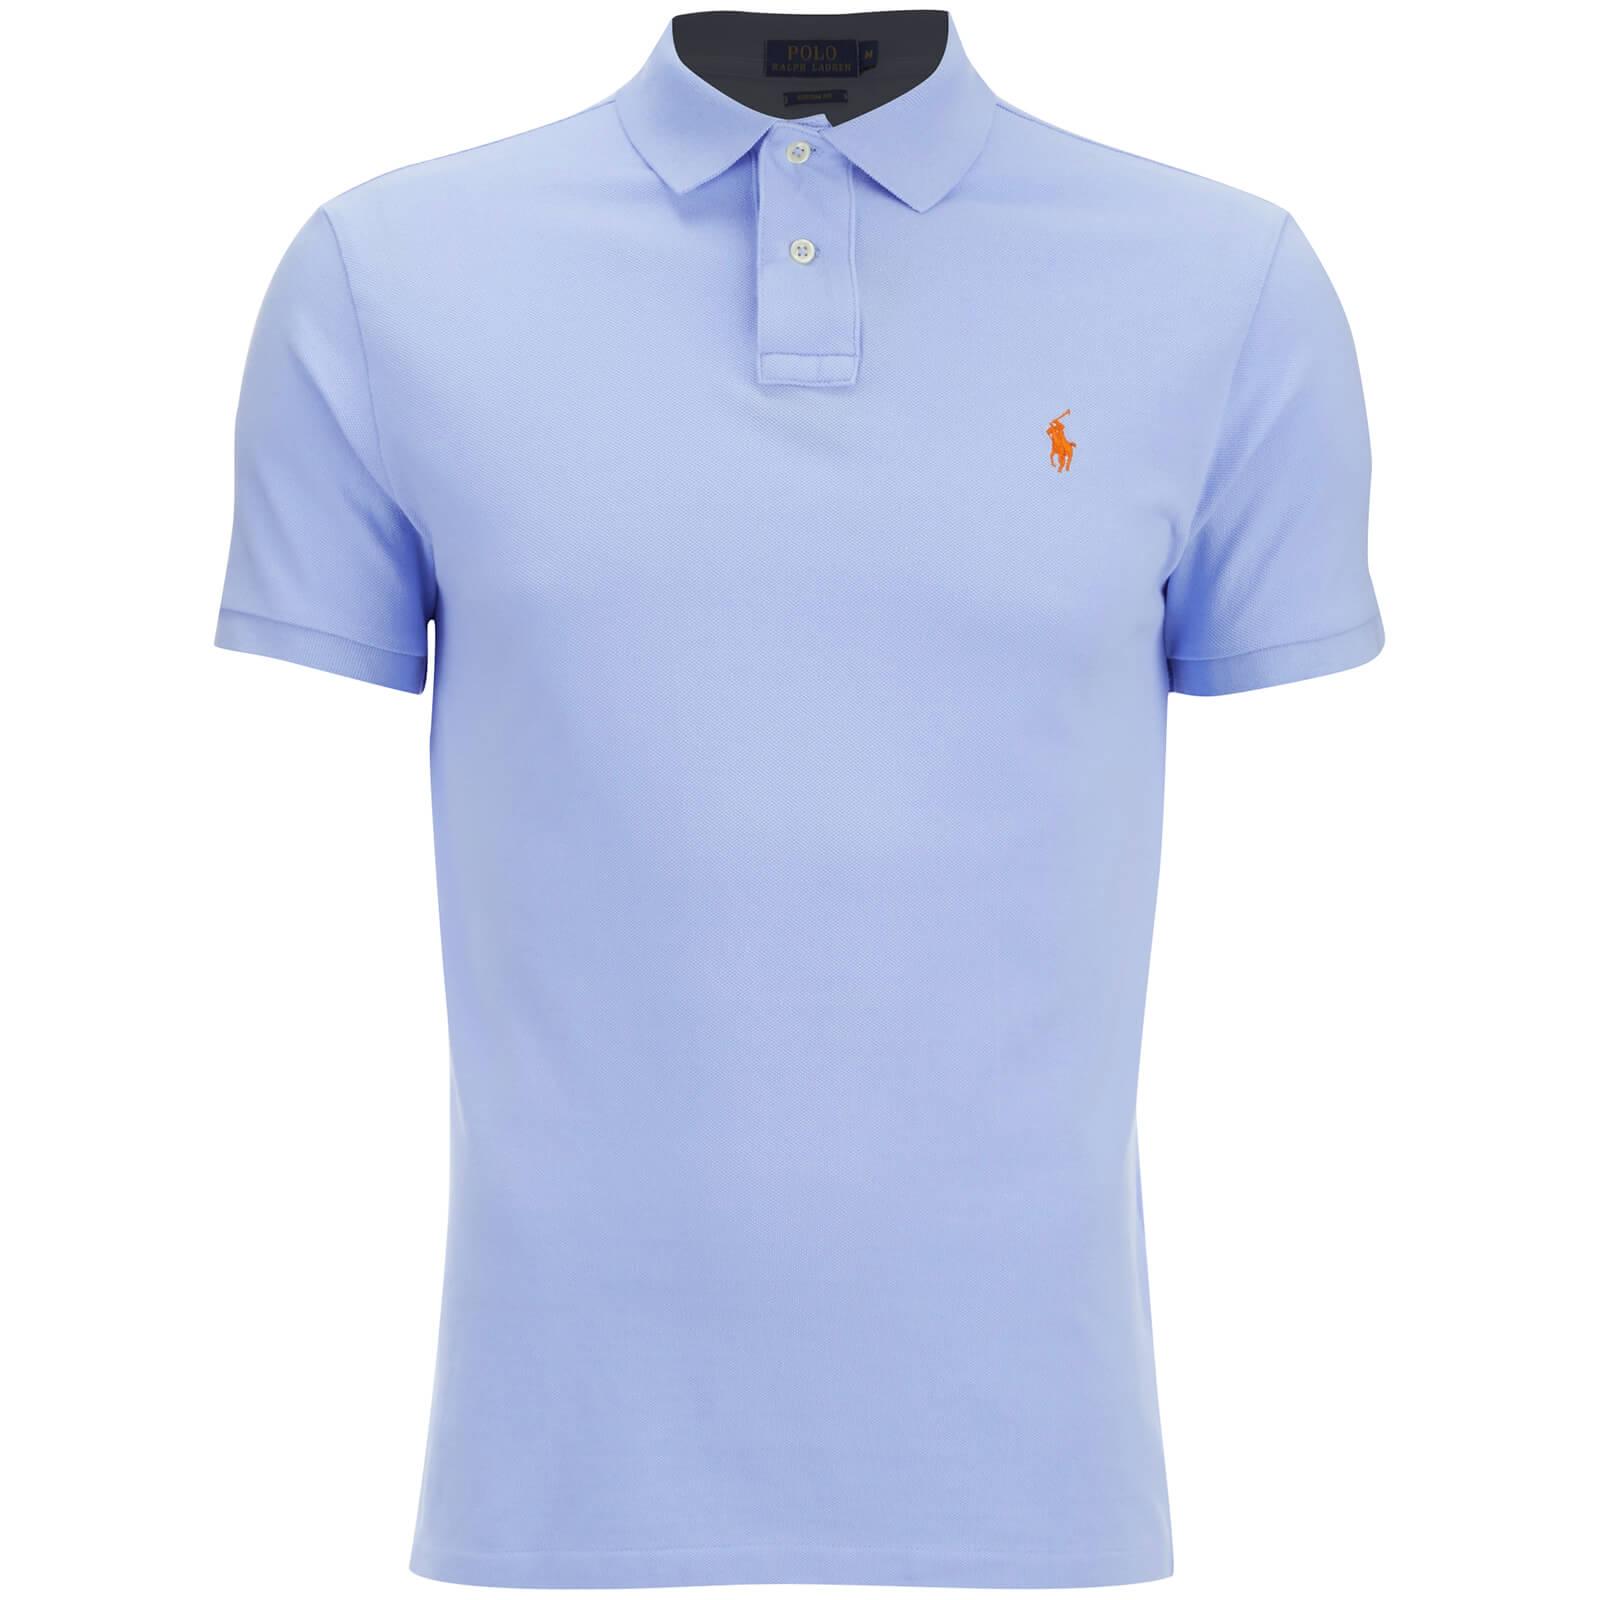 Fit Ralph Shirt Polo Blue Pebble Men's Custom Lauren rthCBdsQx